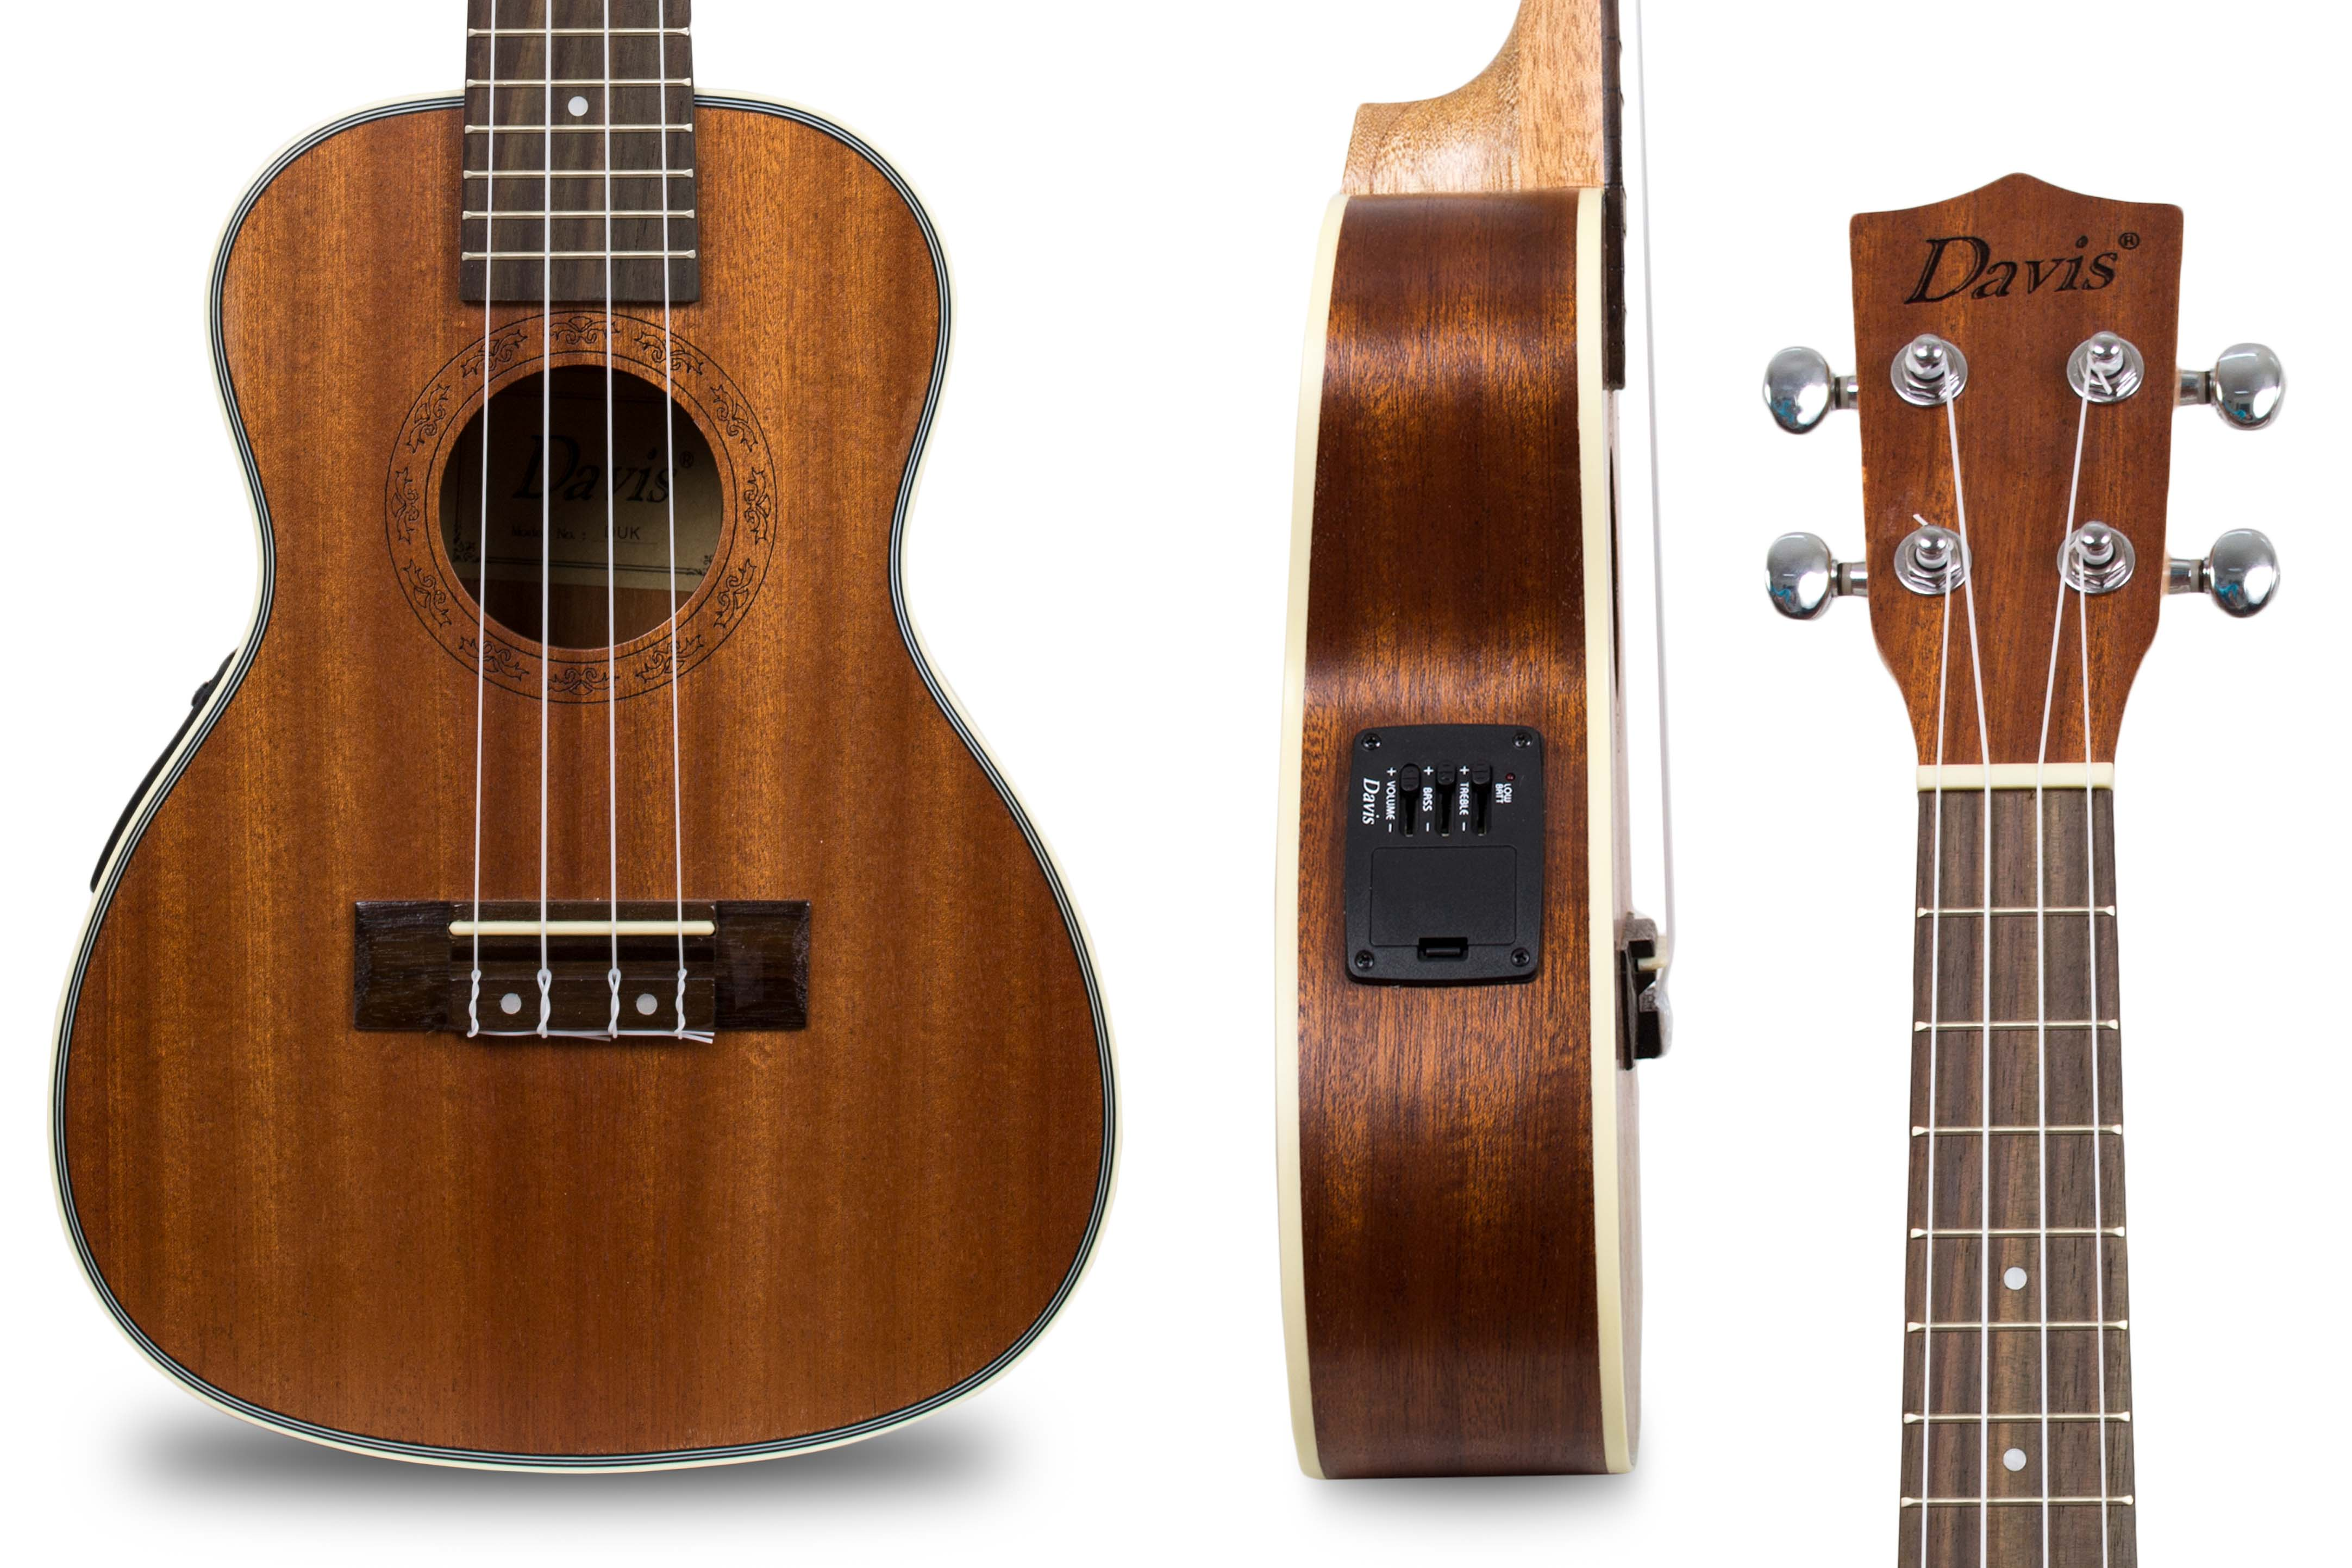 Davis Musical Instruments-DUK-23-N_2